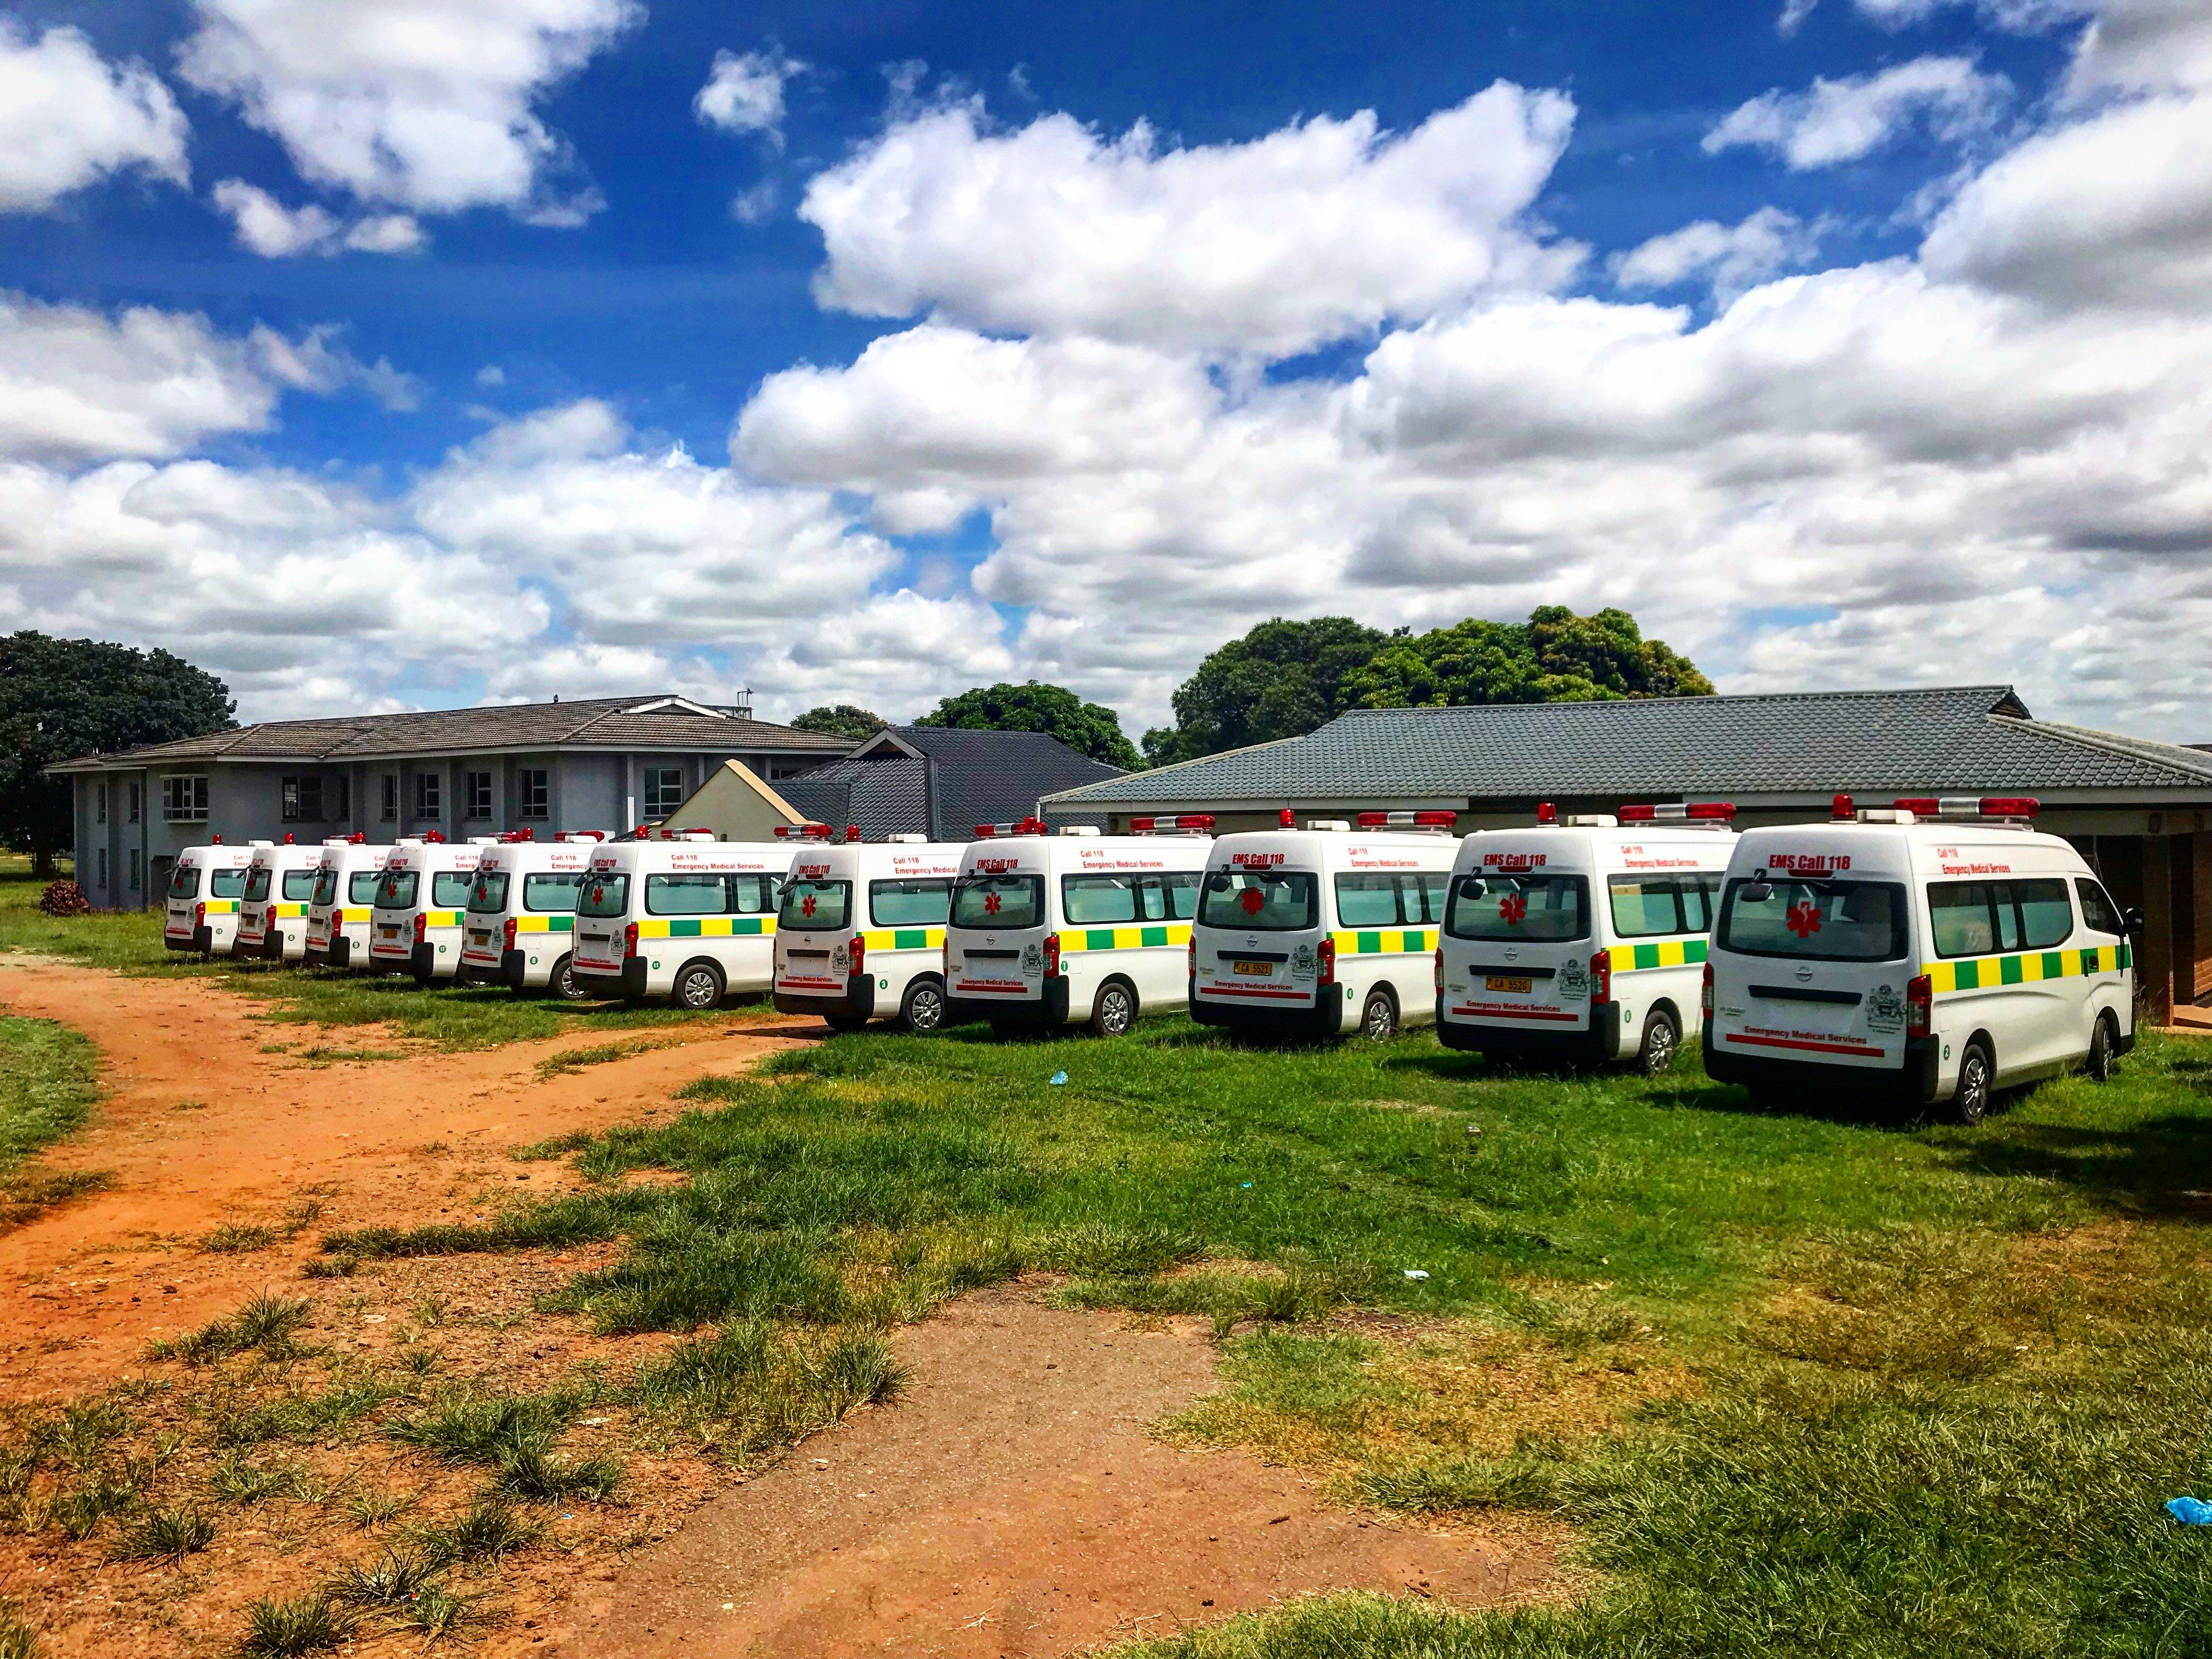 118 Ambulances - Malawi Ministry of Health